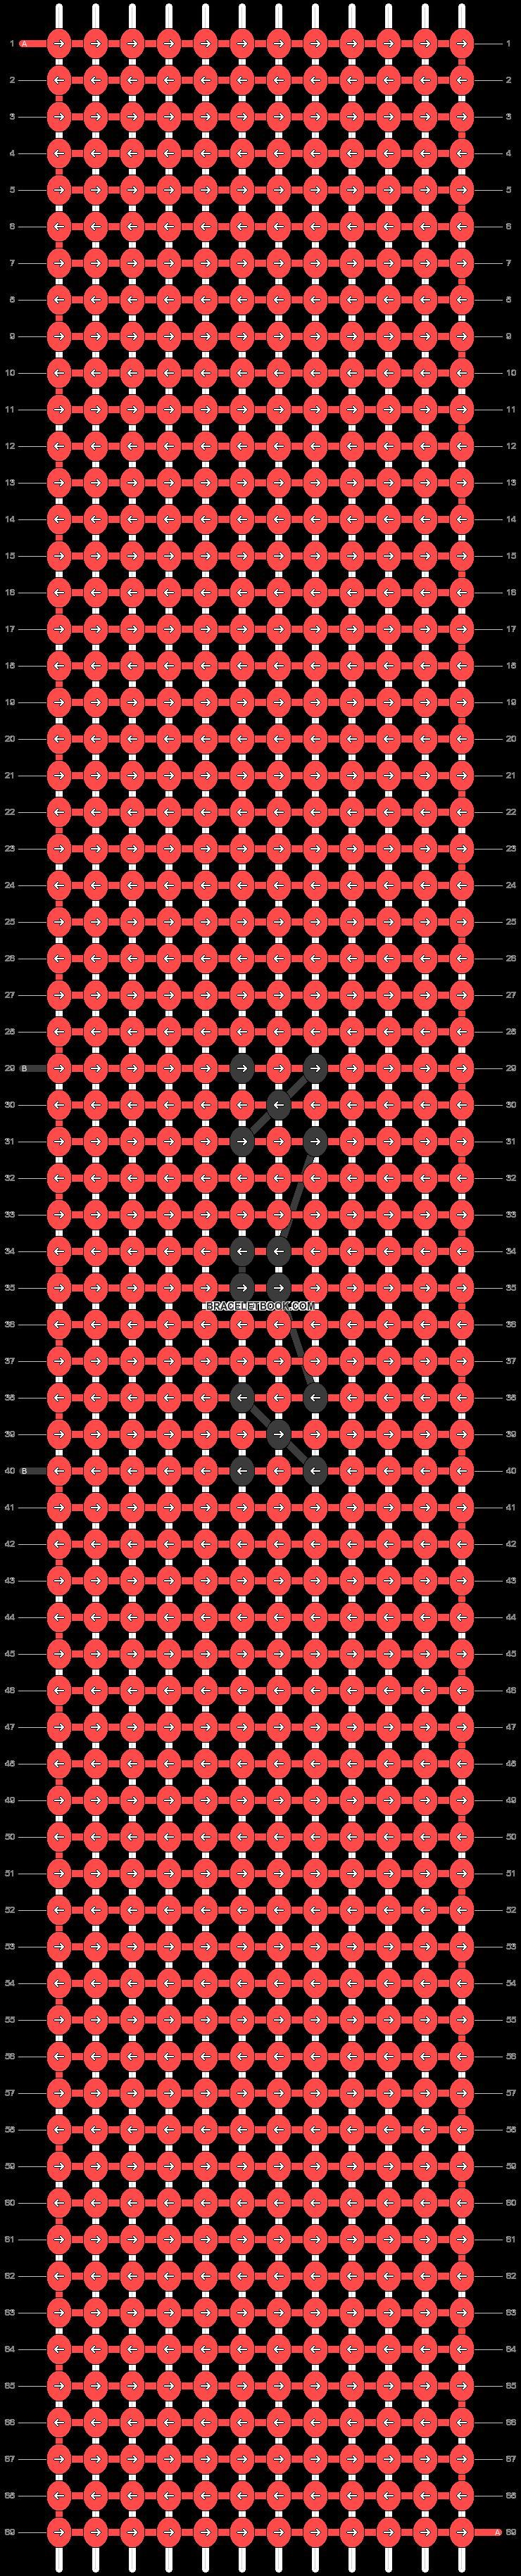 Alpha pattern #46038 pattern